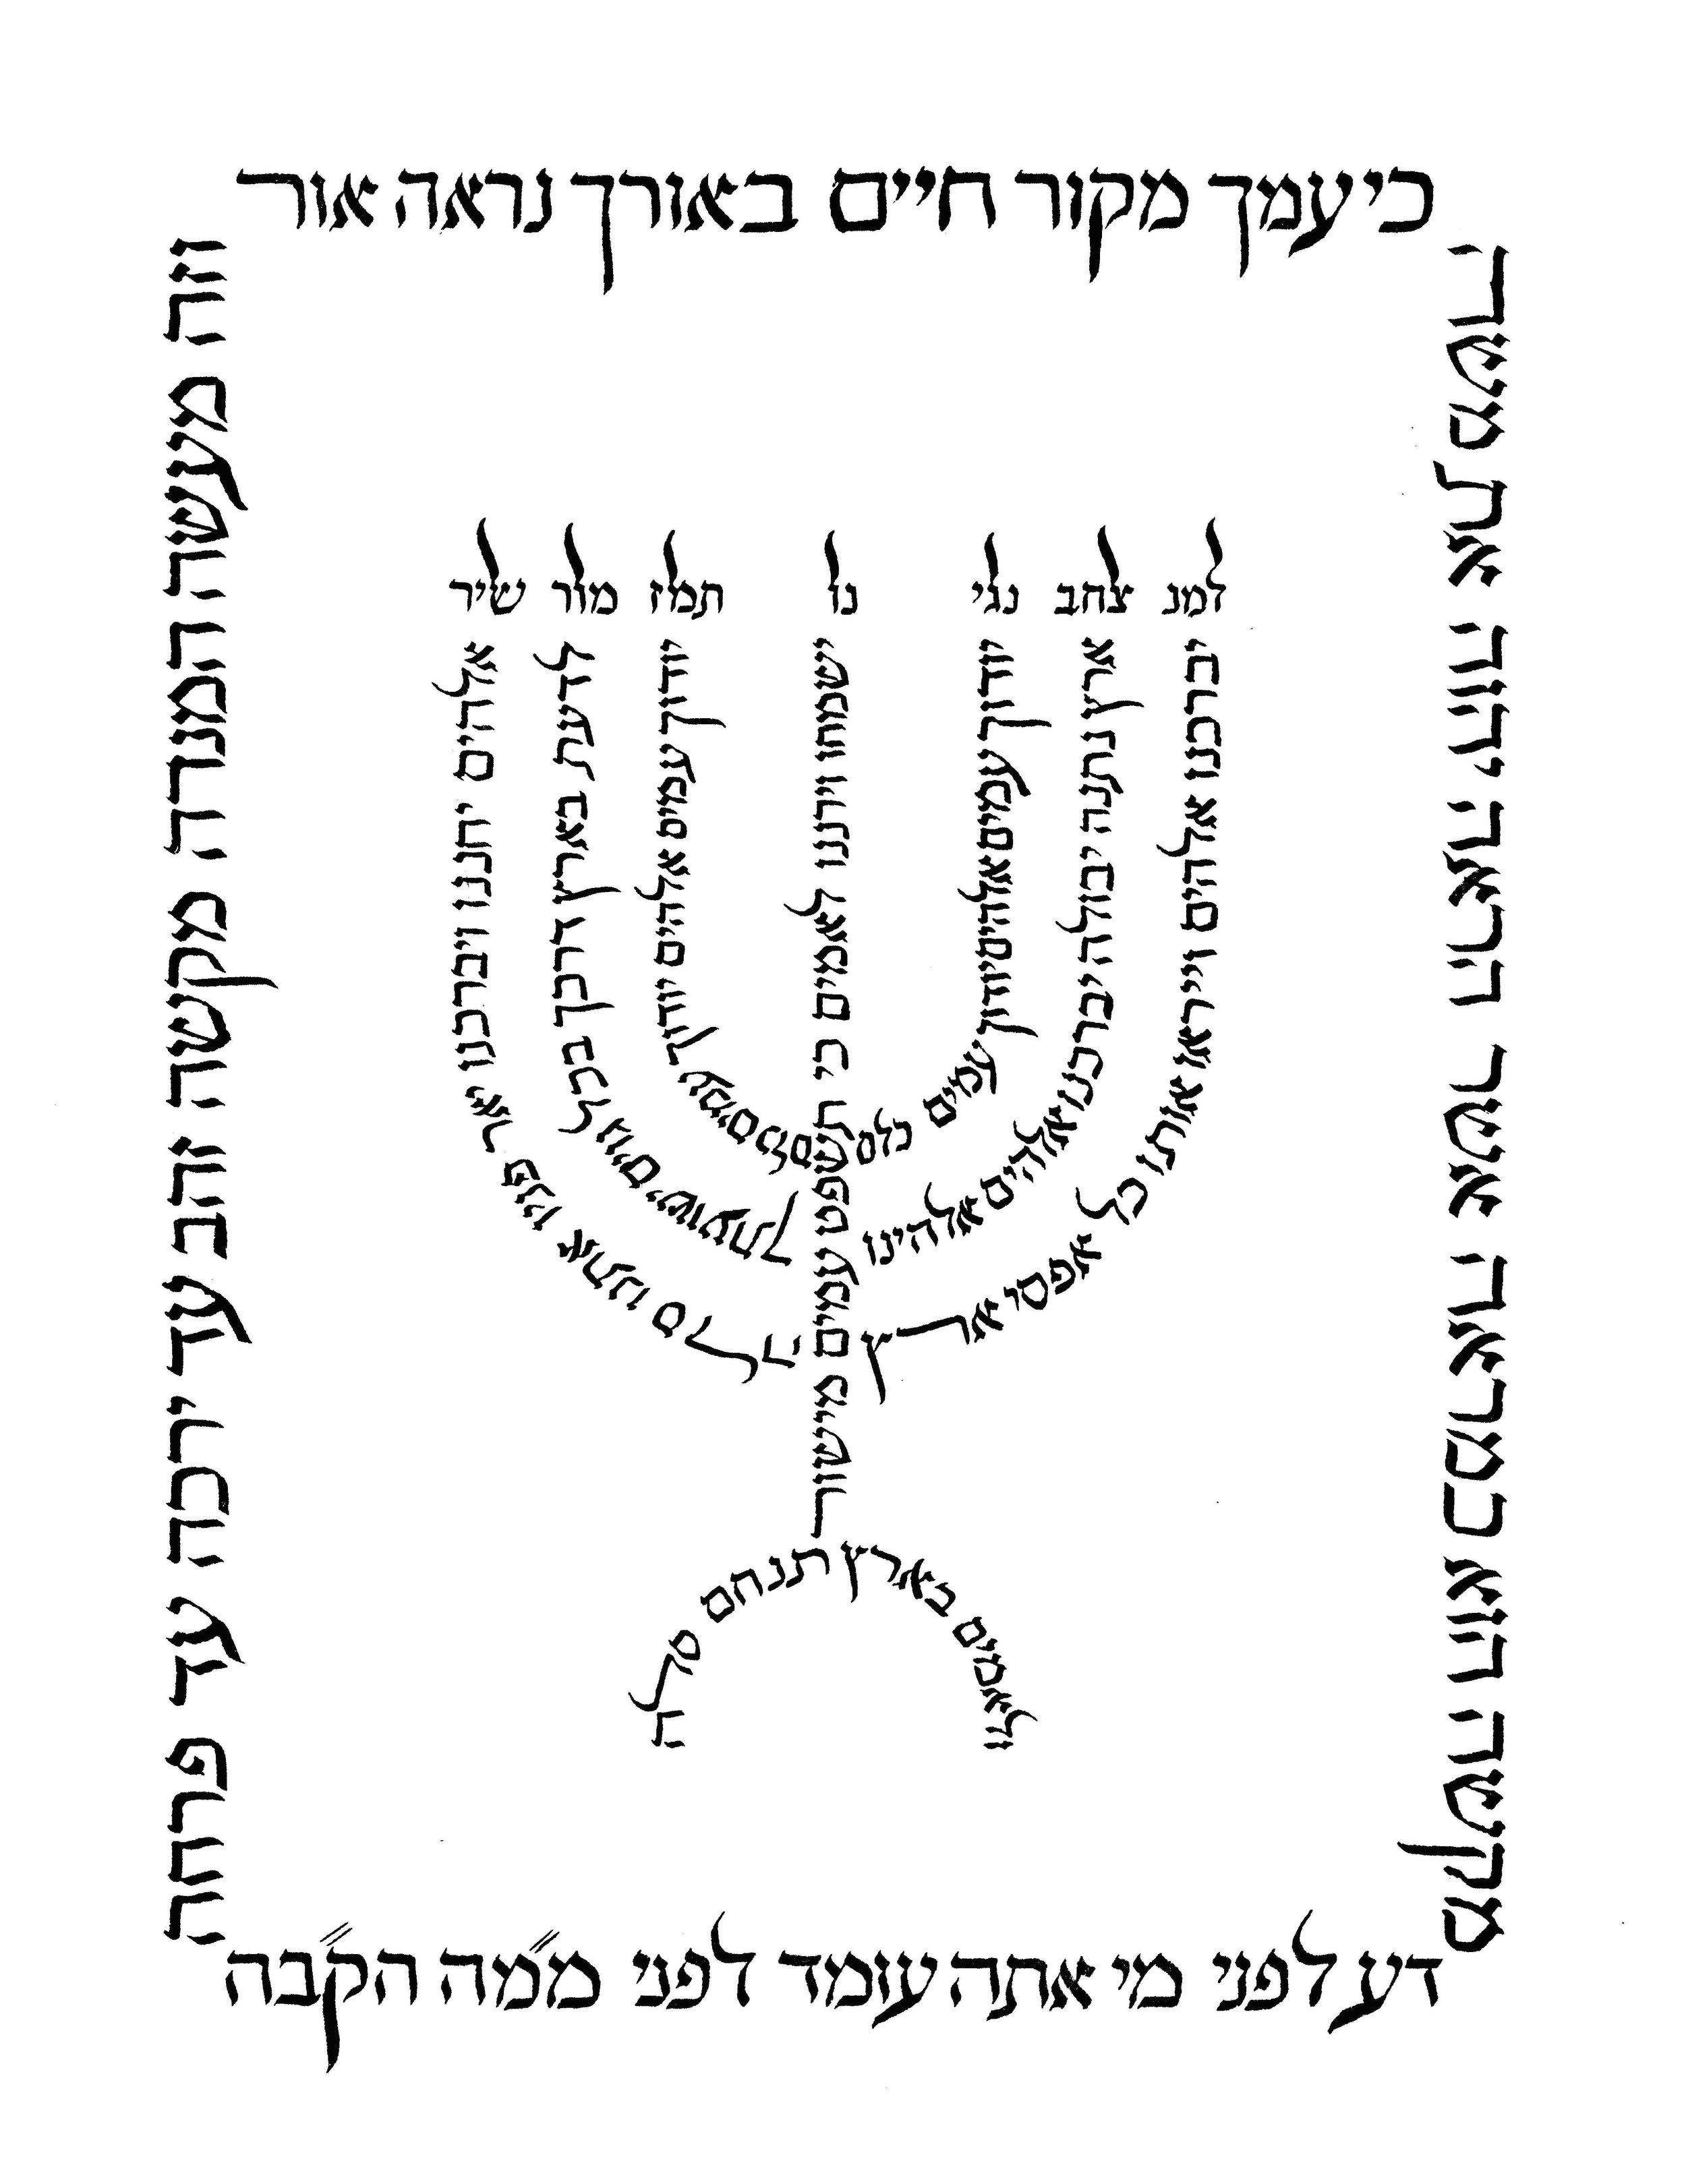 menorah 1 original.jpg